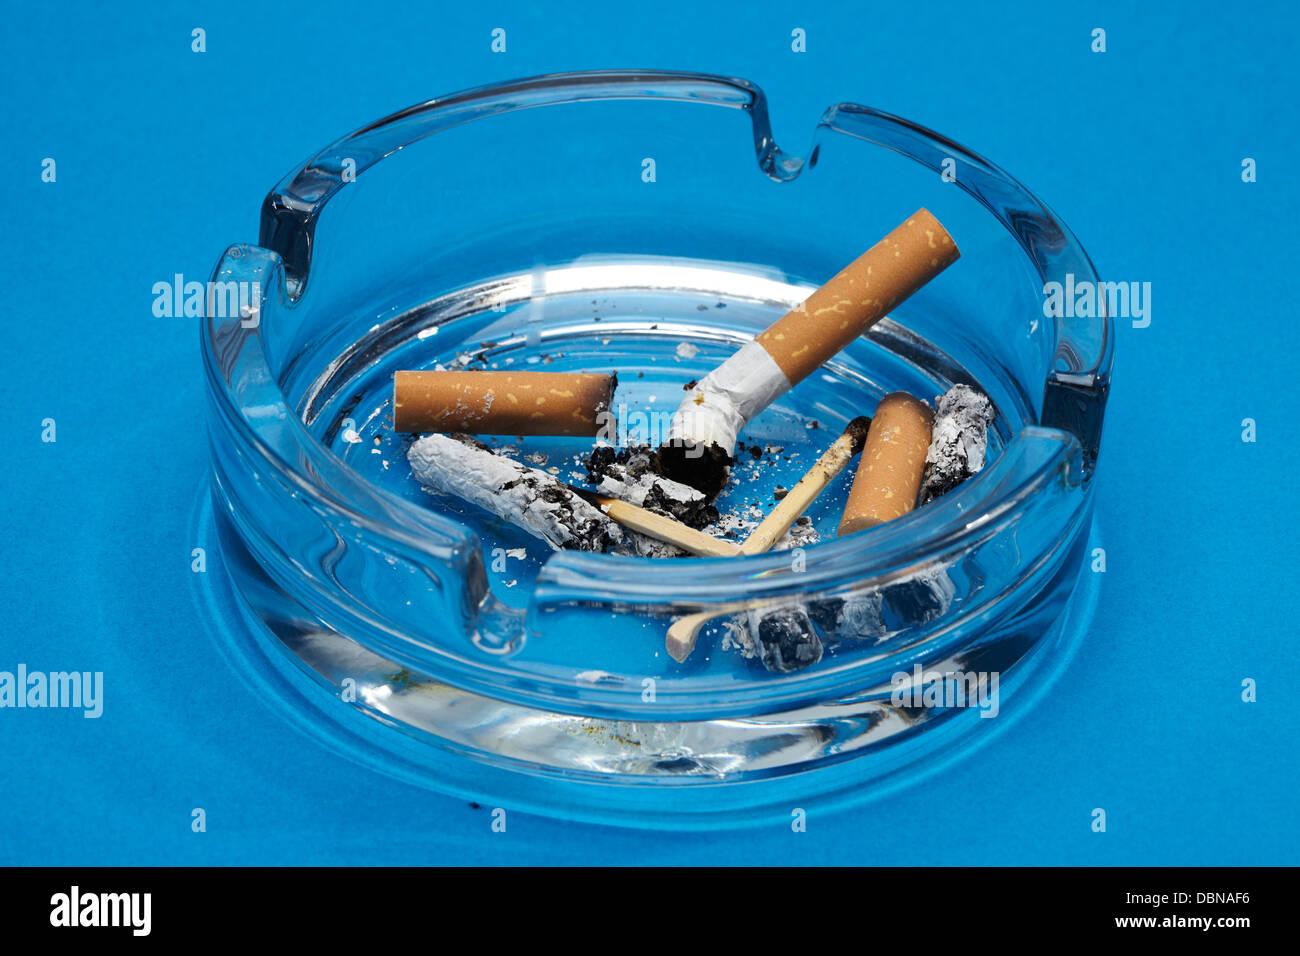 Ashtray Cigarettes Stock Photos & Ashtray Cigarettes Stock Images ...